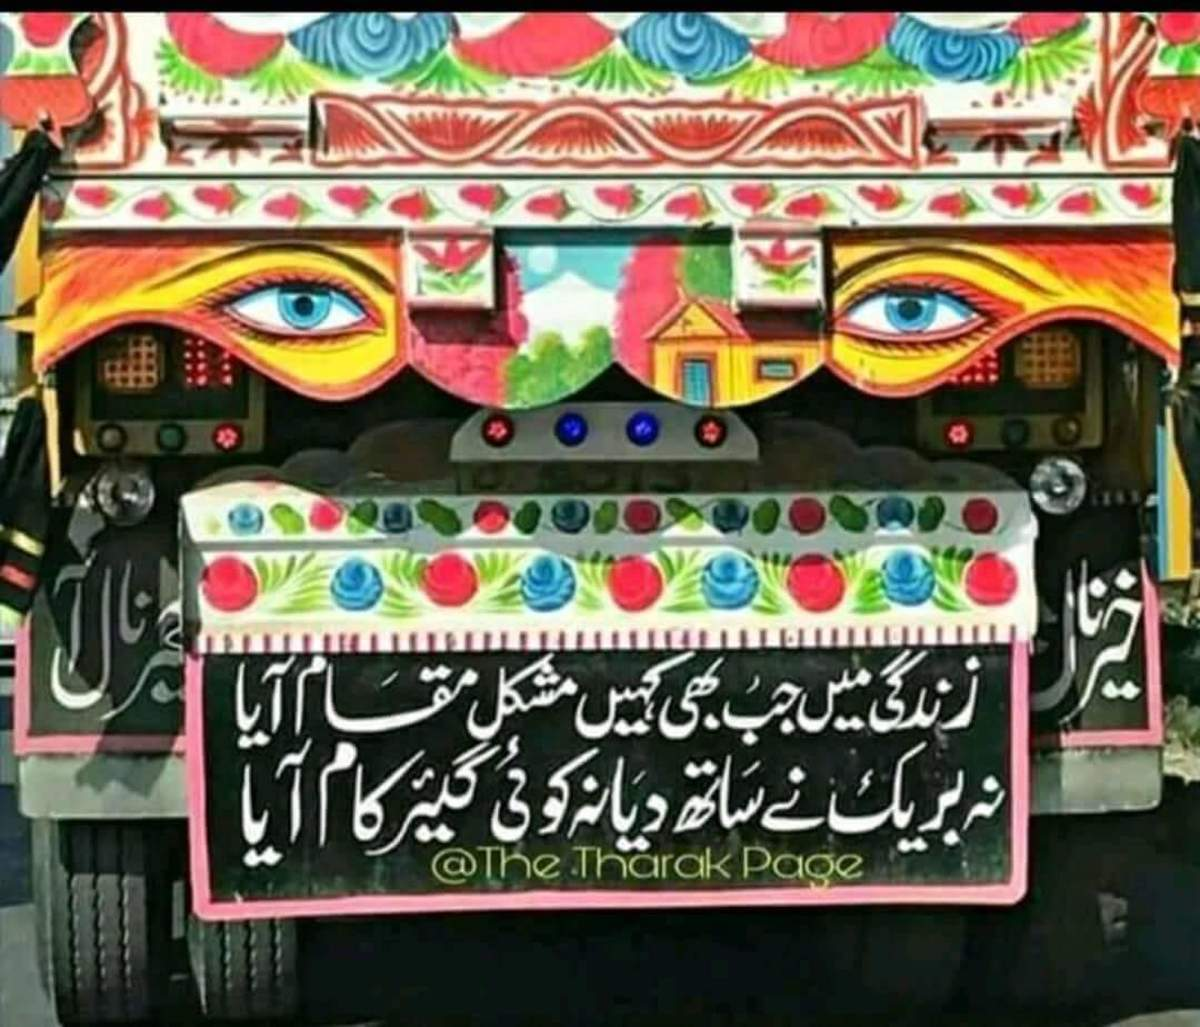 Lyrical style to express feelings. Poetry written in Urdu language is a distinct feature of truck art.